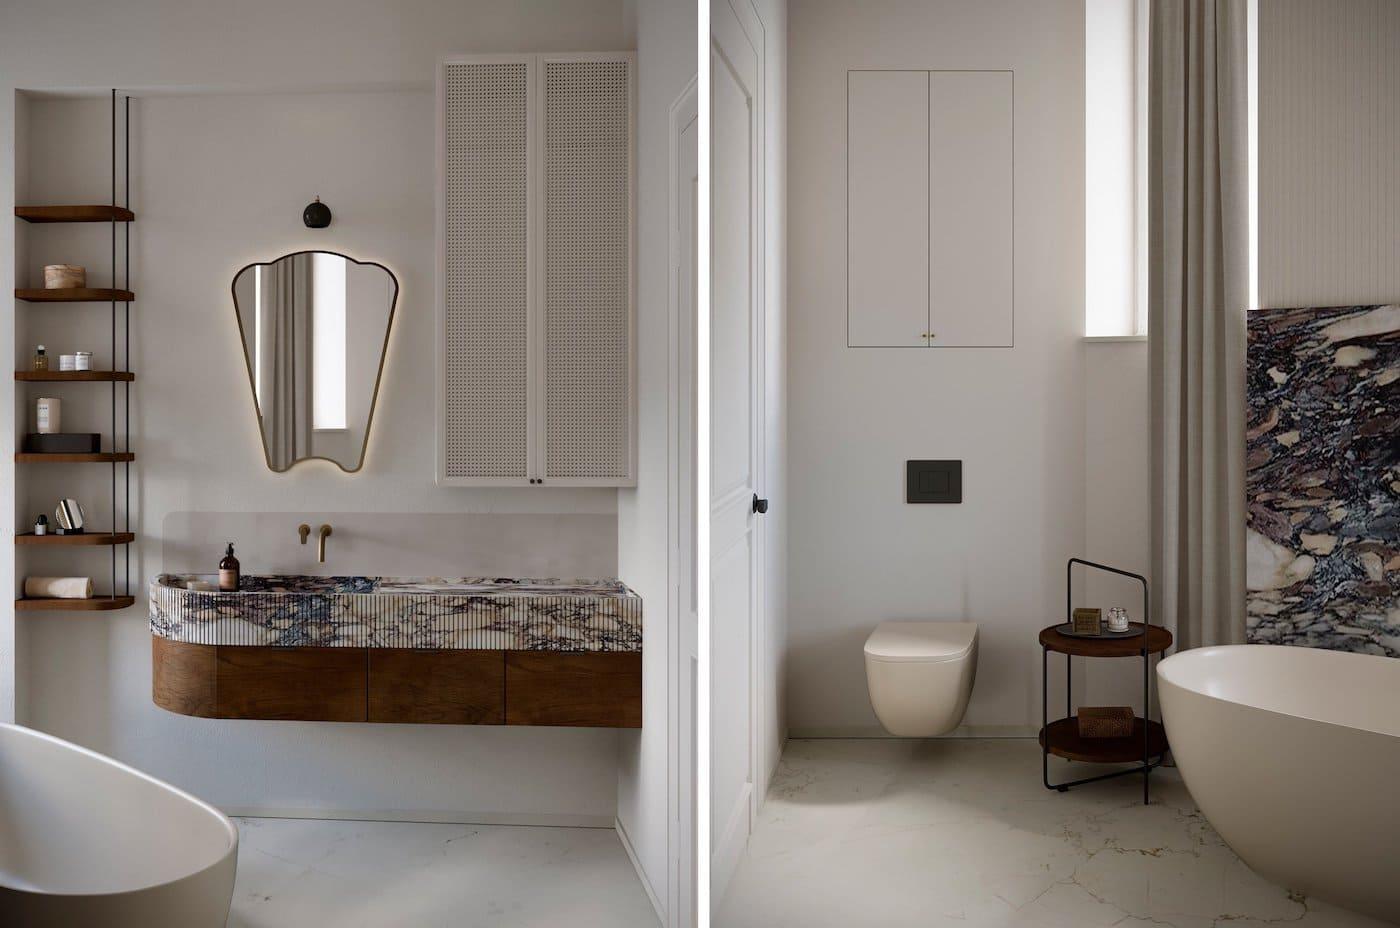 модный дизайн интерьера квартиры фото 19